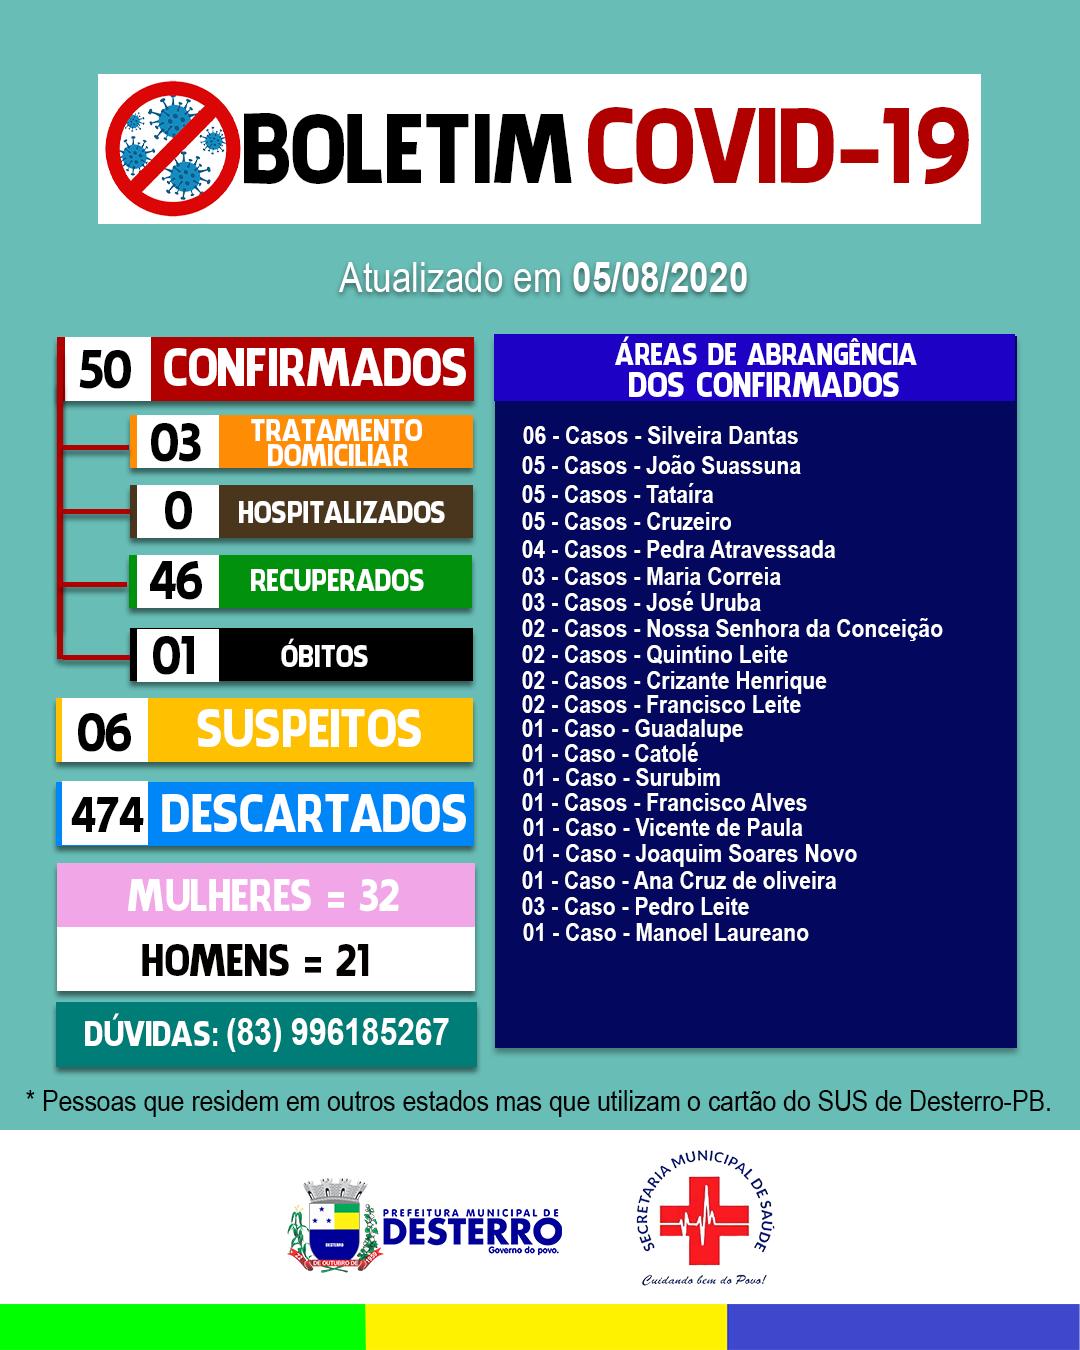 Boletim Covid-19 (05/08/2020)